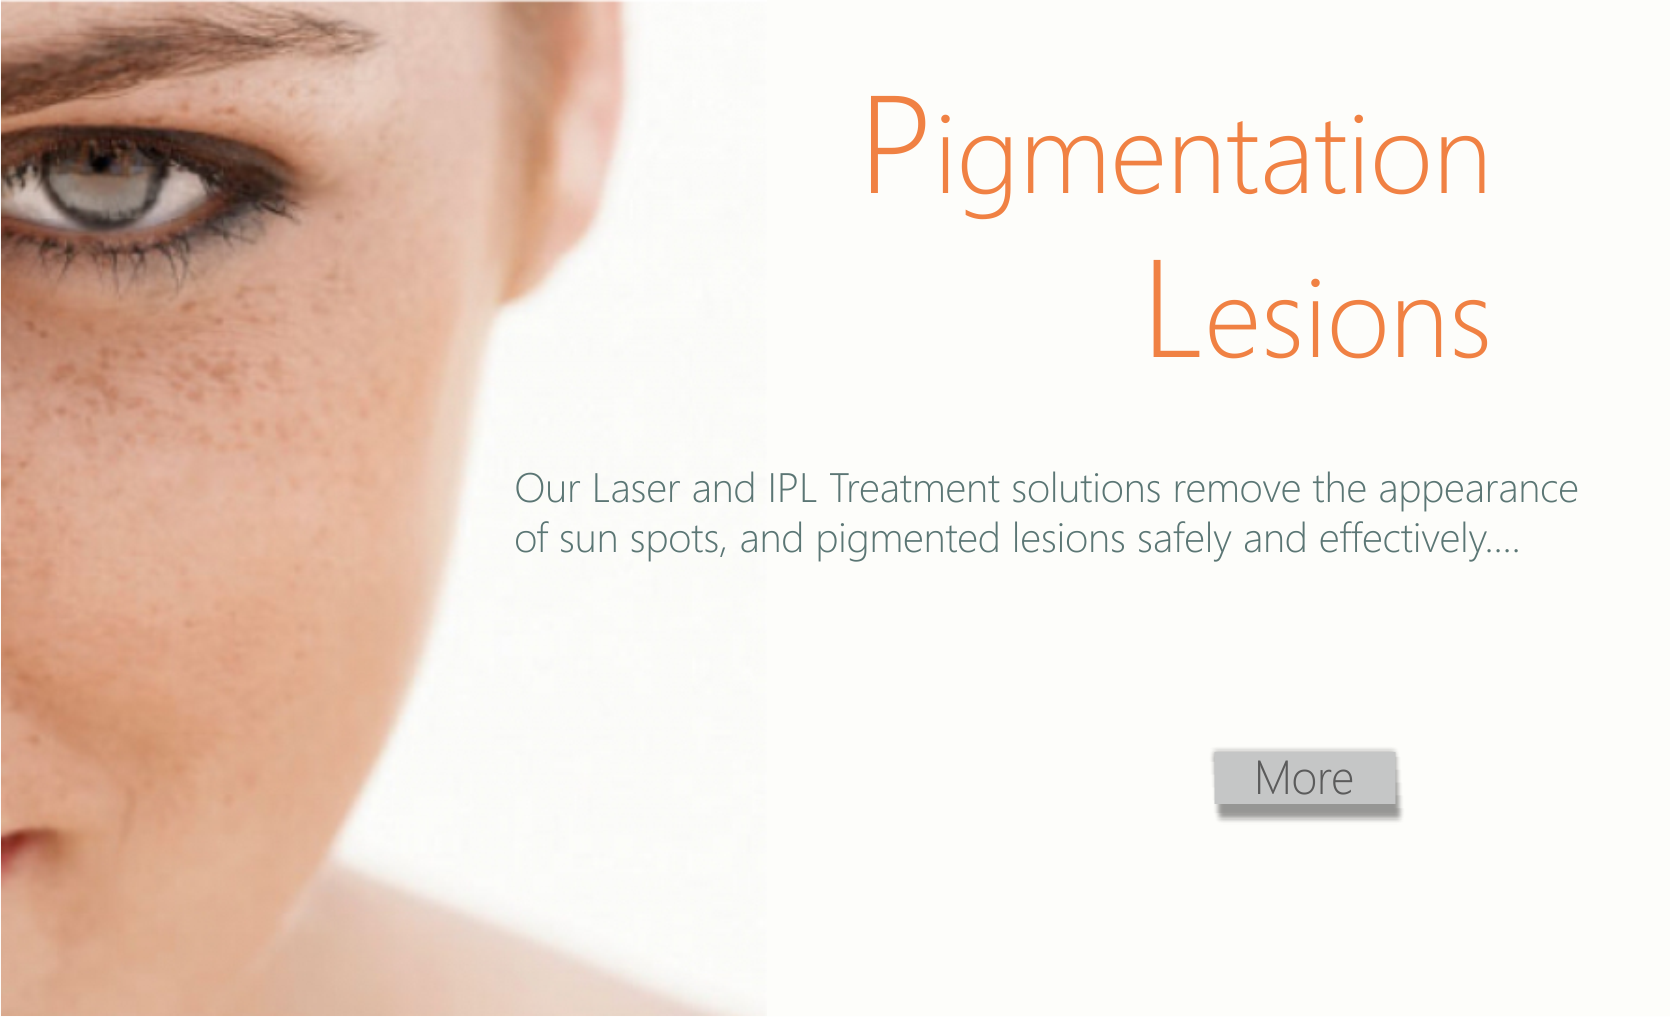 Pigmentation lesion